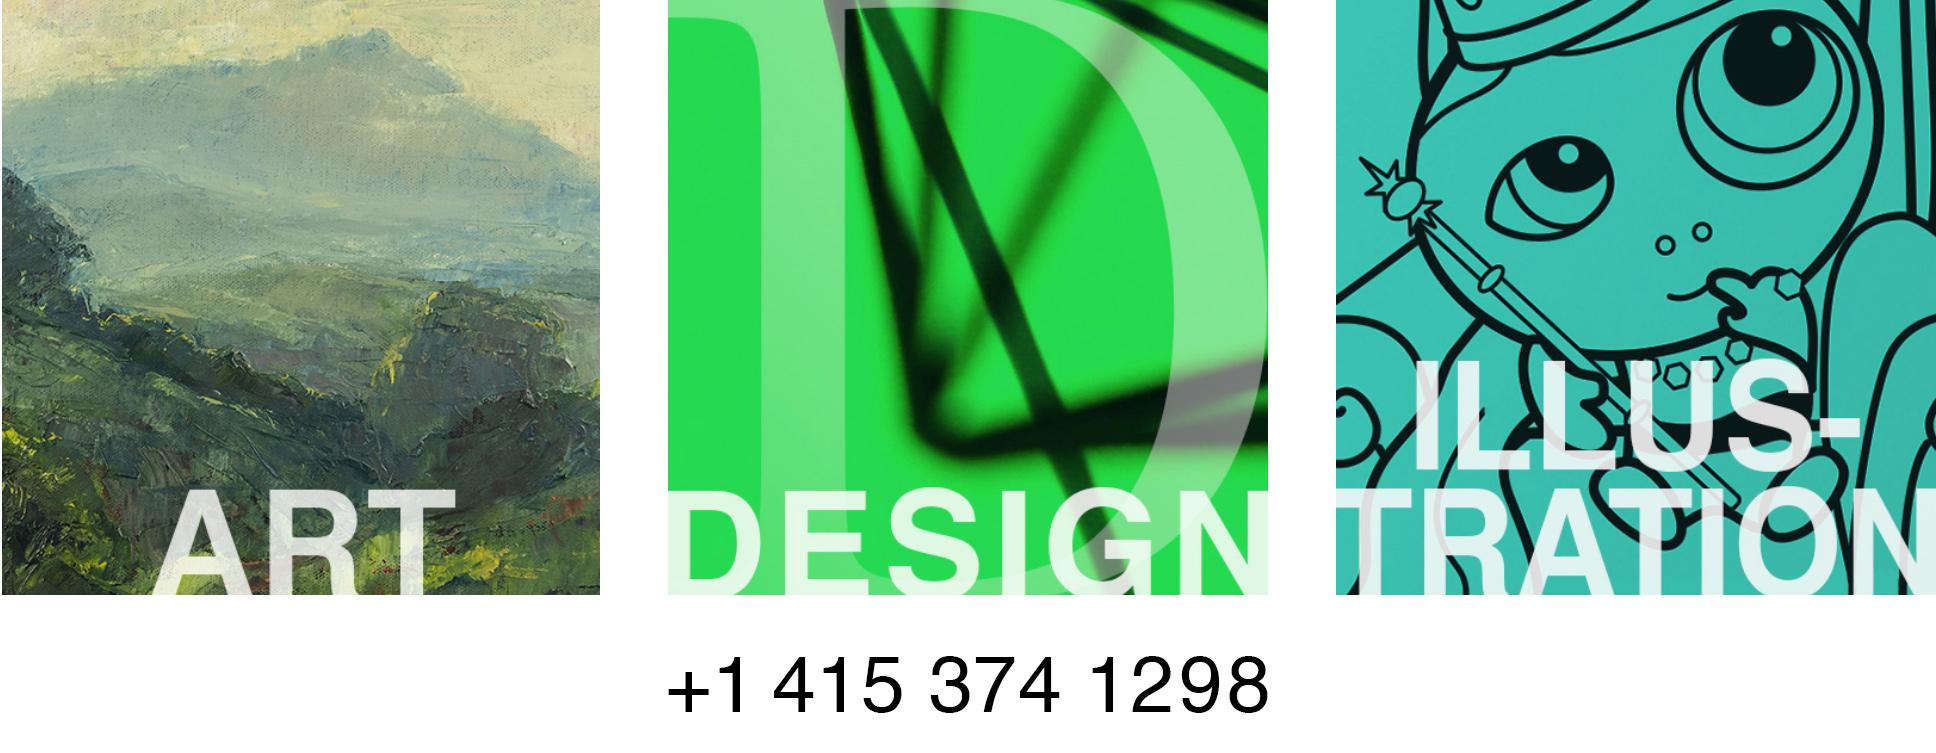 Contact-banner-2.jpg